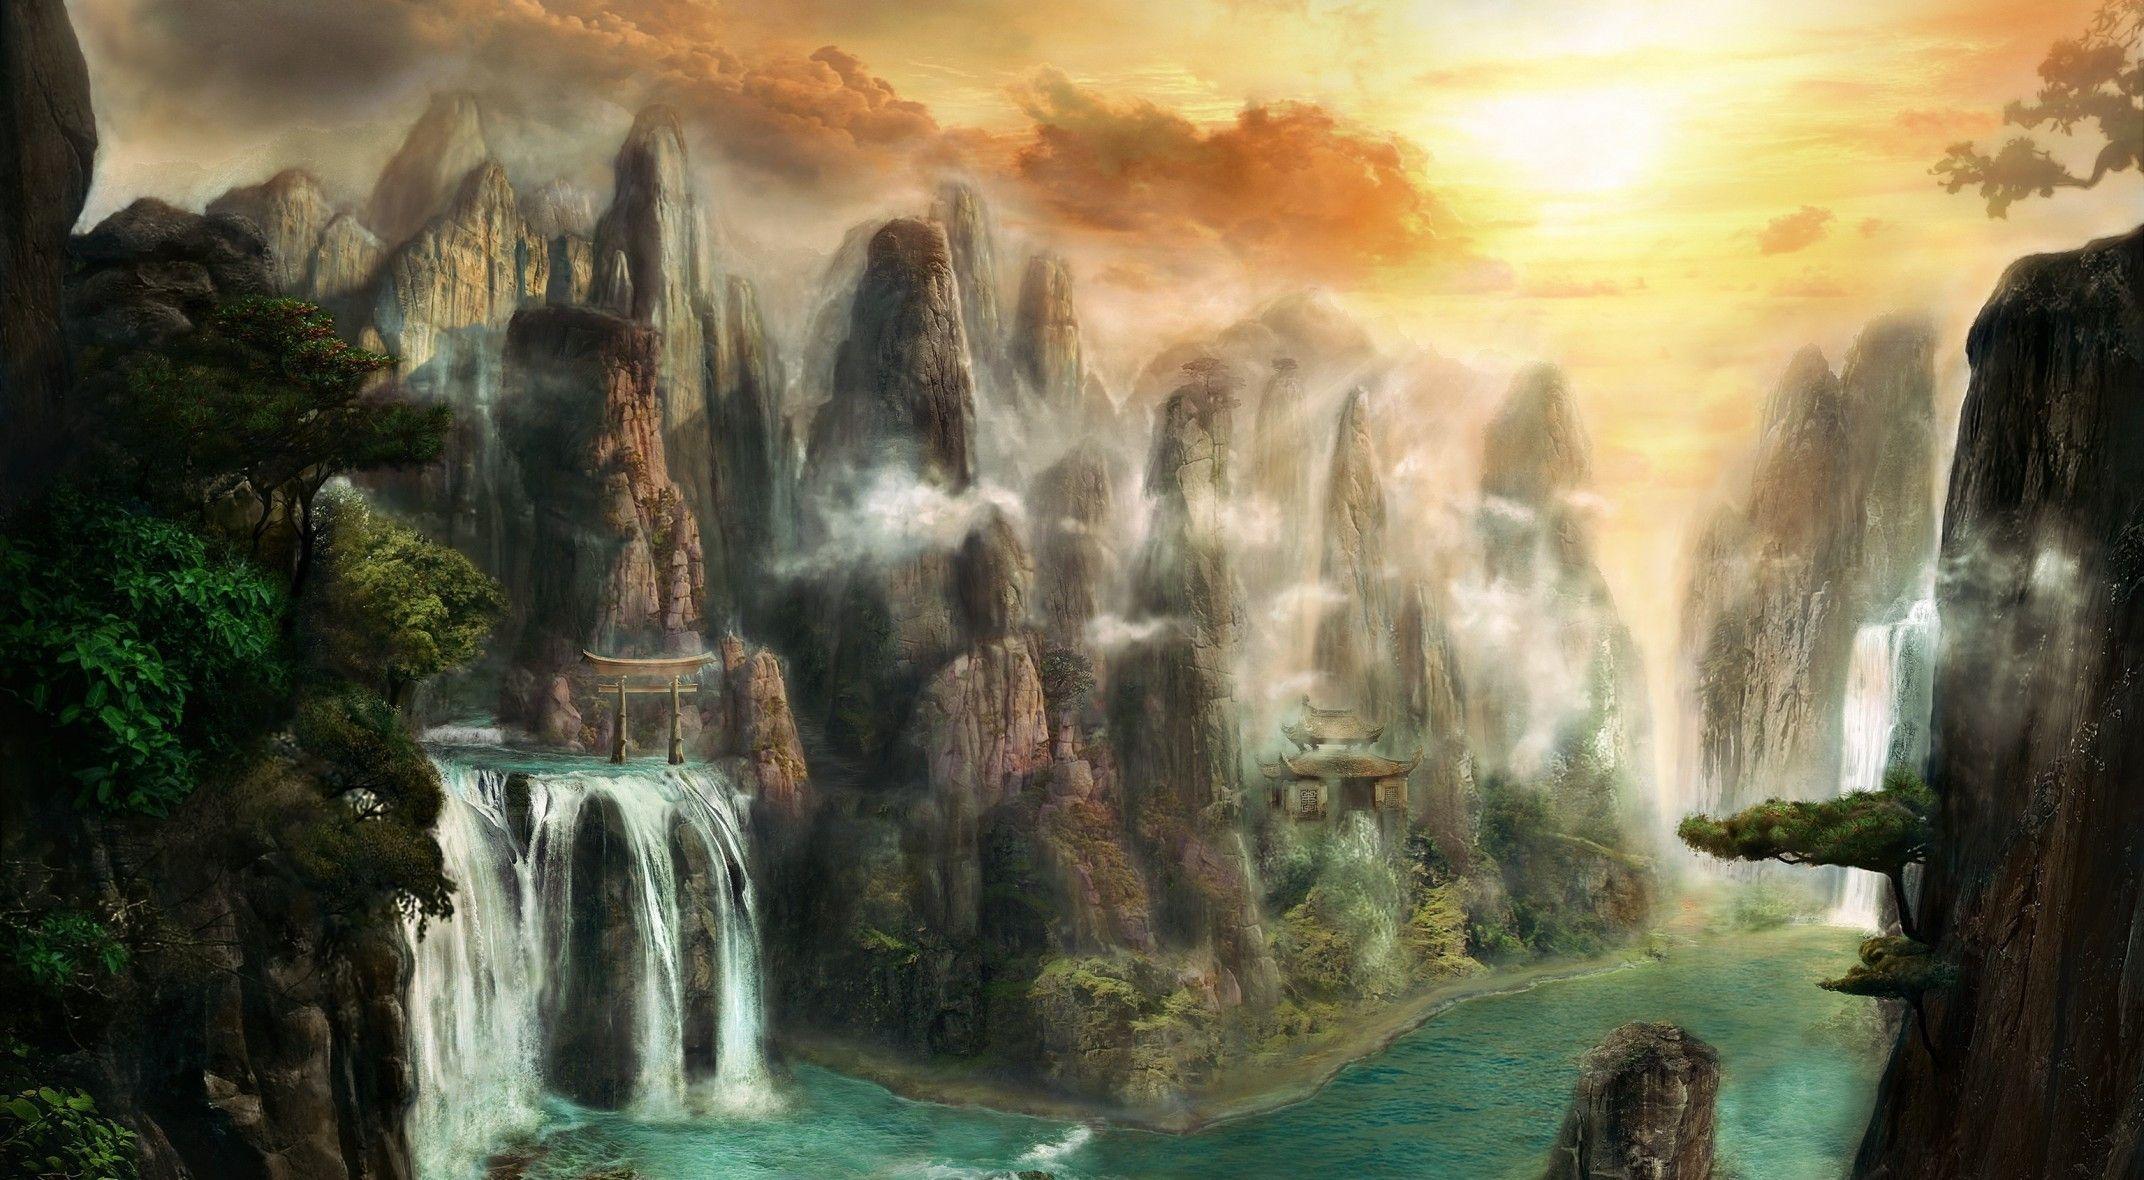 fantasy landscape wallpapers hd | pixelstalk